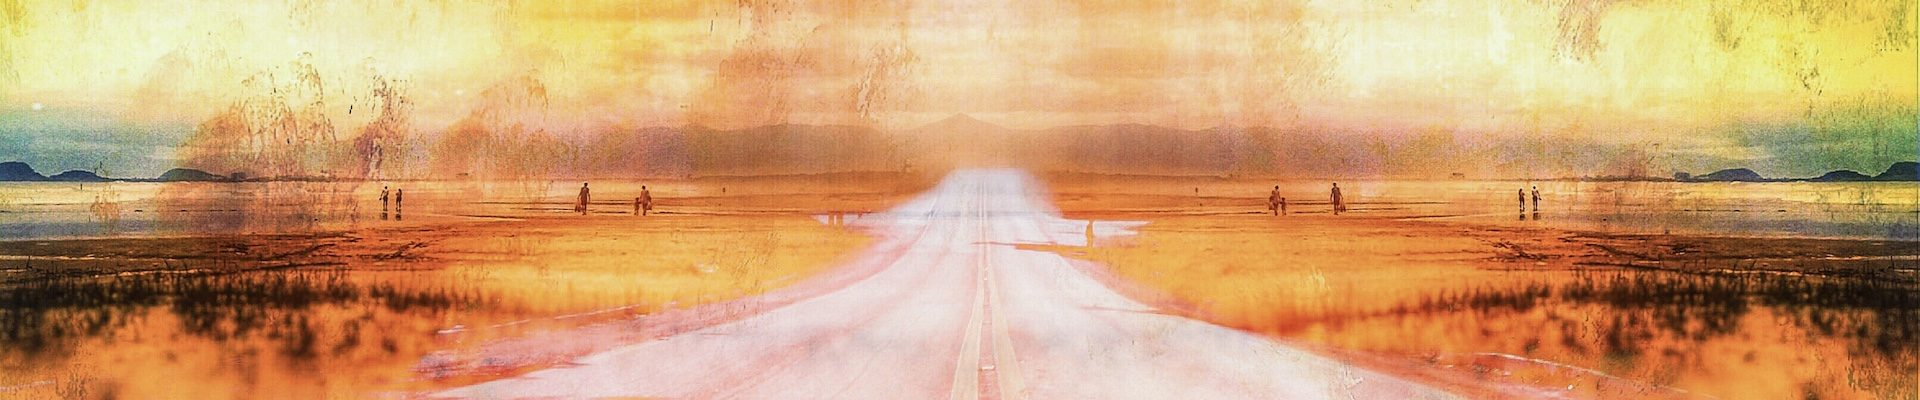 The Loneliest Road (Intensification)